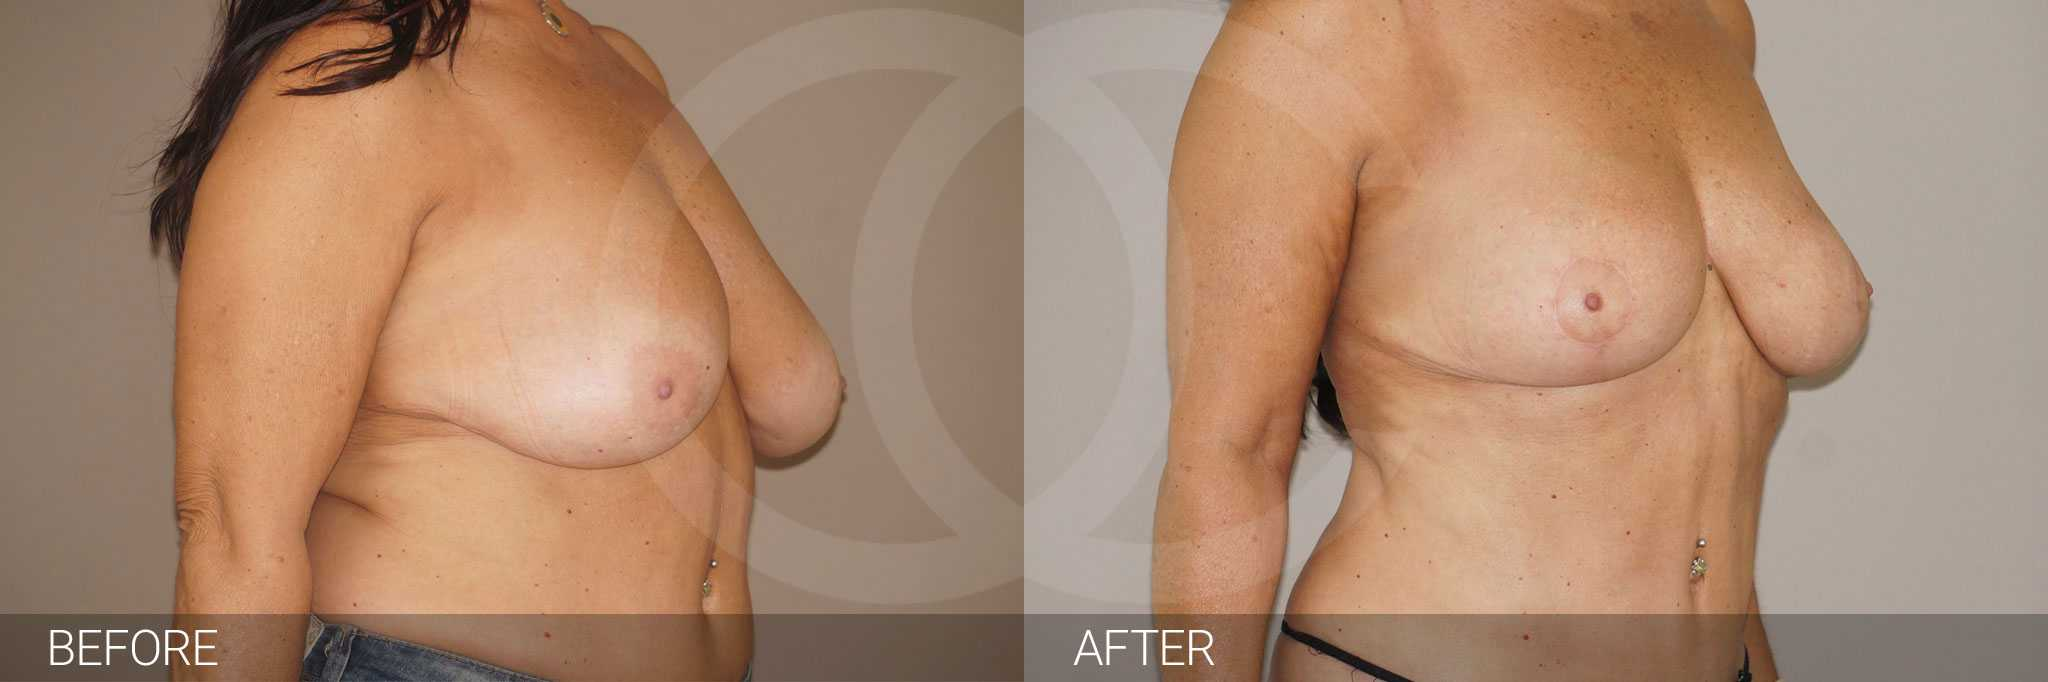 Réduction mammaire 4 ante/post-op II